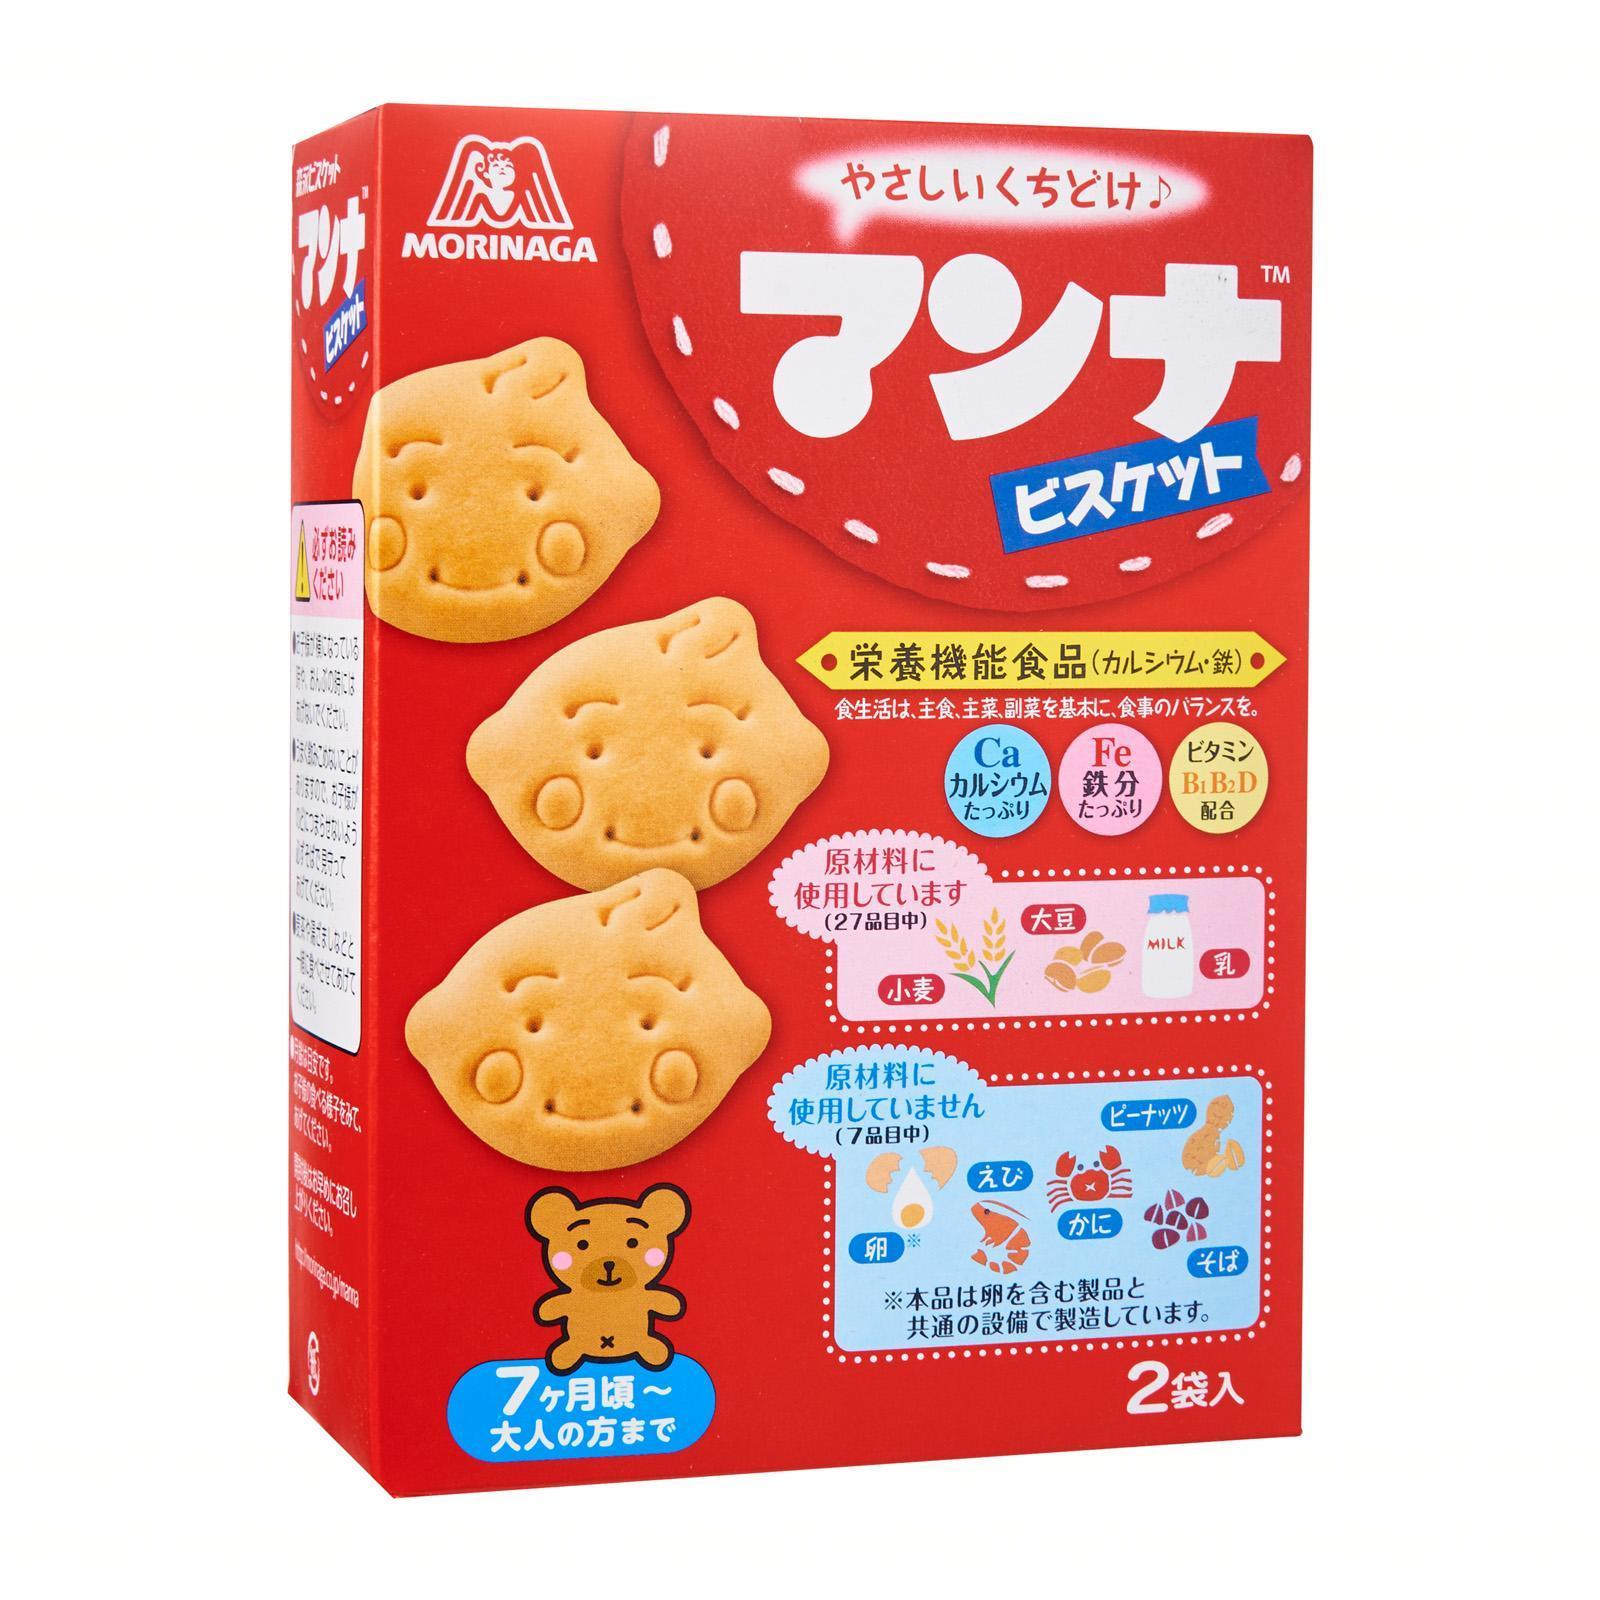 Morinaga Manna Biscuit - Jetro Special